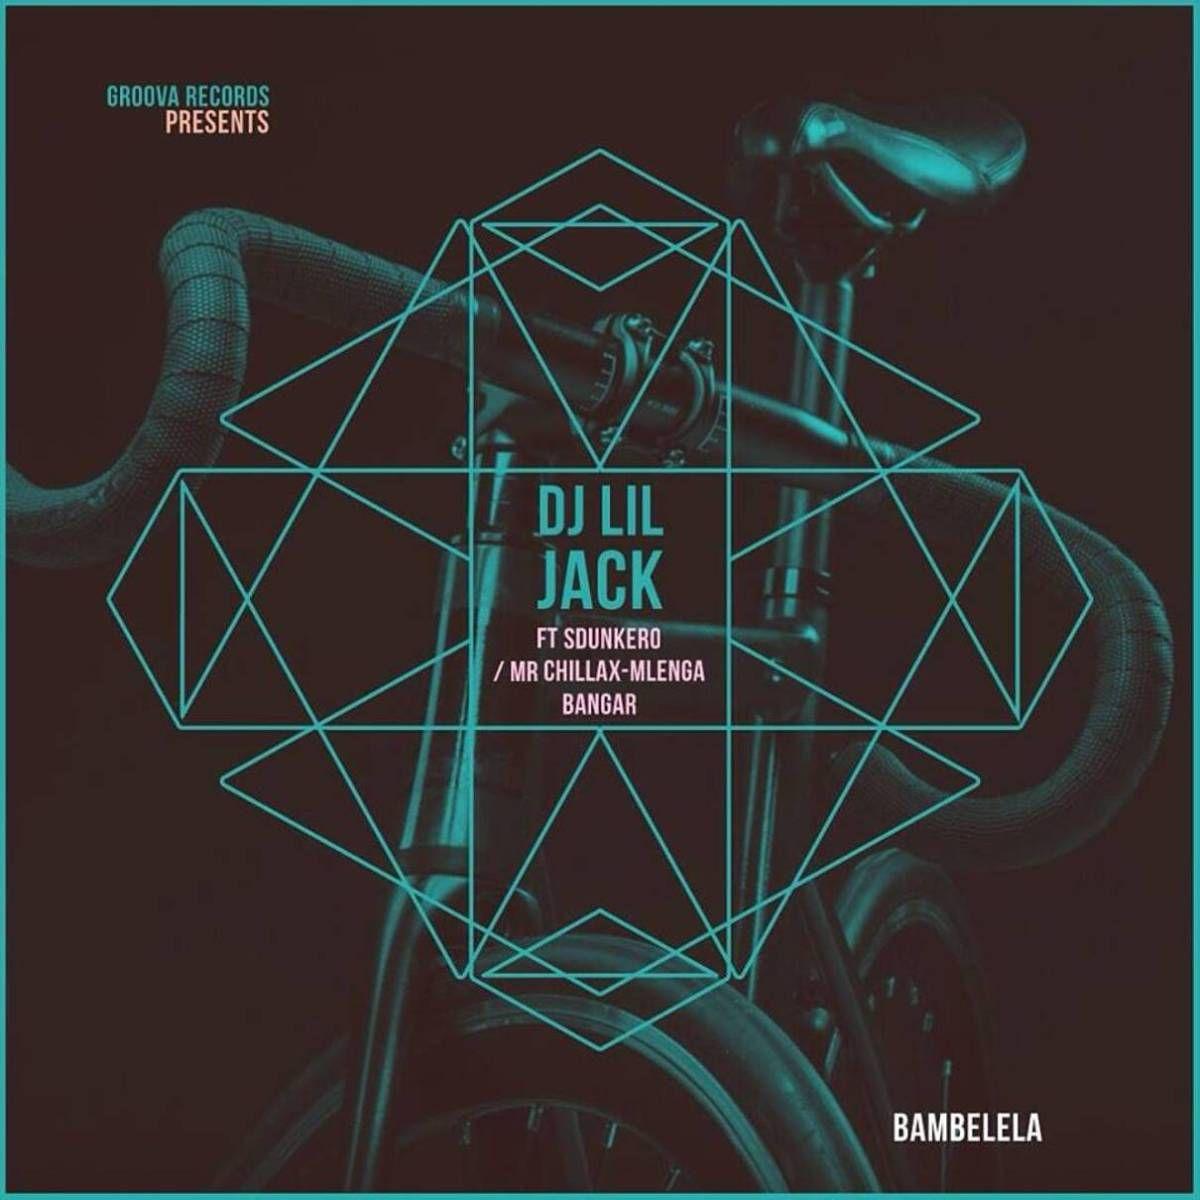 Dj Lil Jack Bambelela Feat Dj Sdunkero Mr Chillax Mlenga Benga Chillax Dj House Music